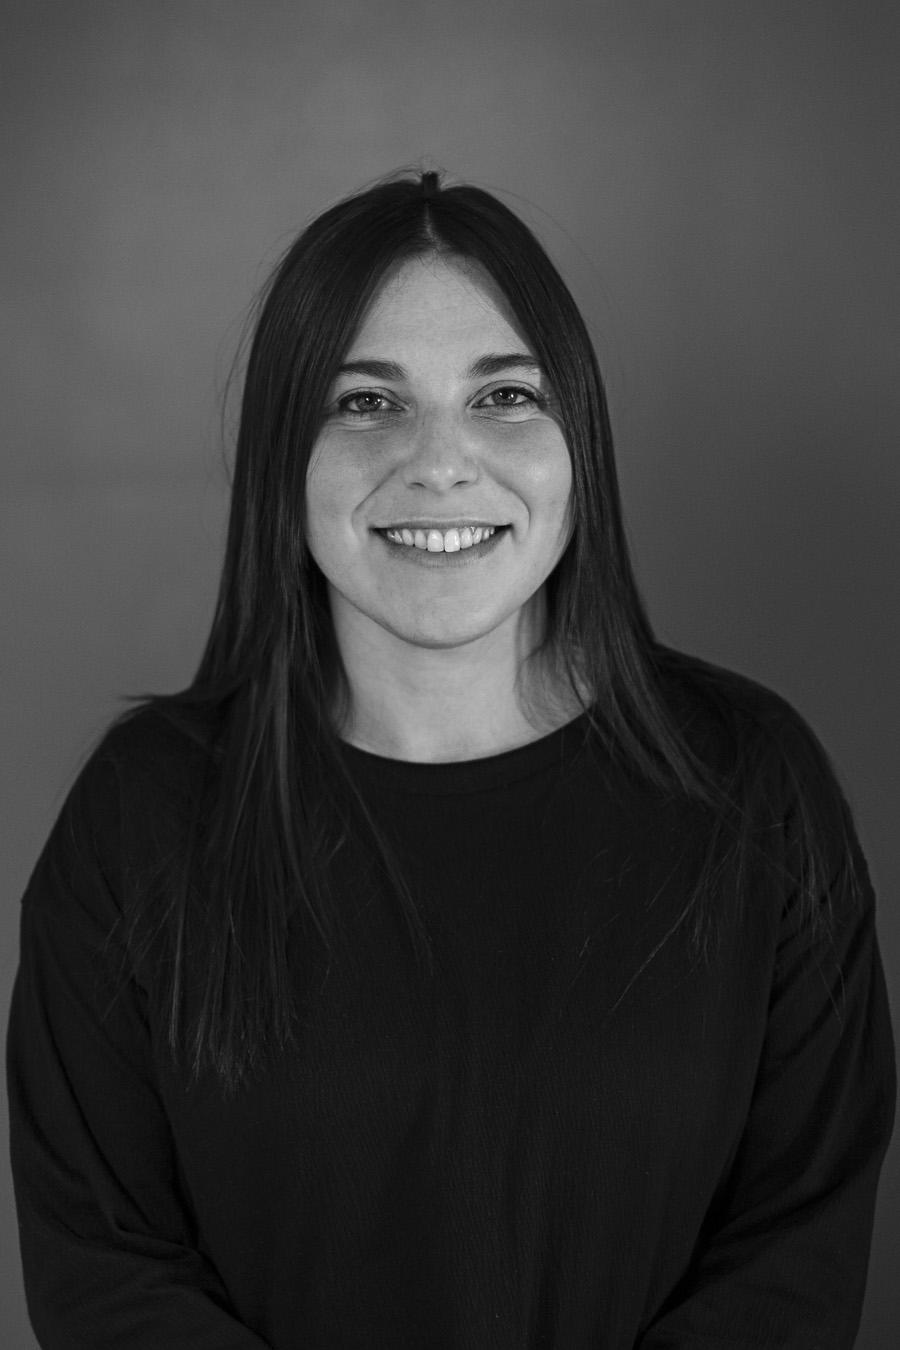 Verònica Lopez